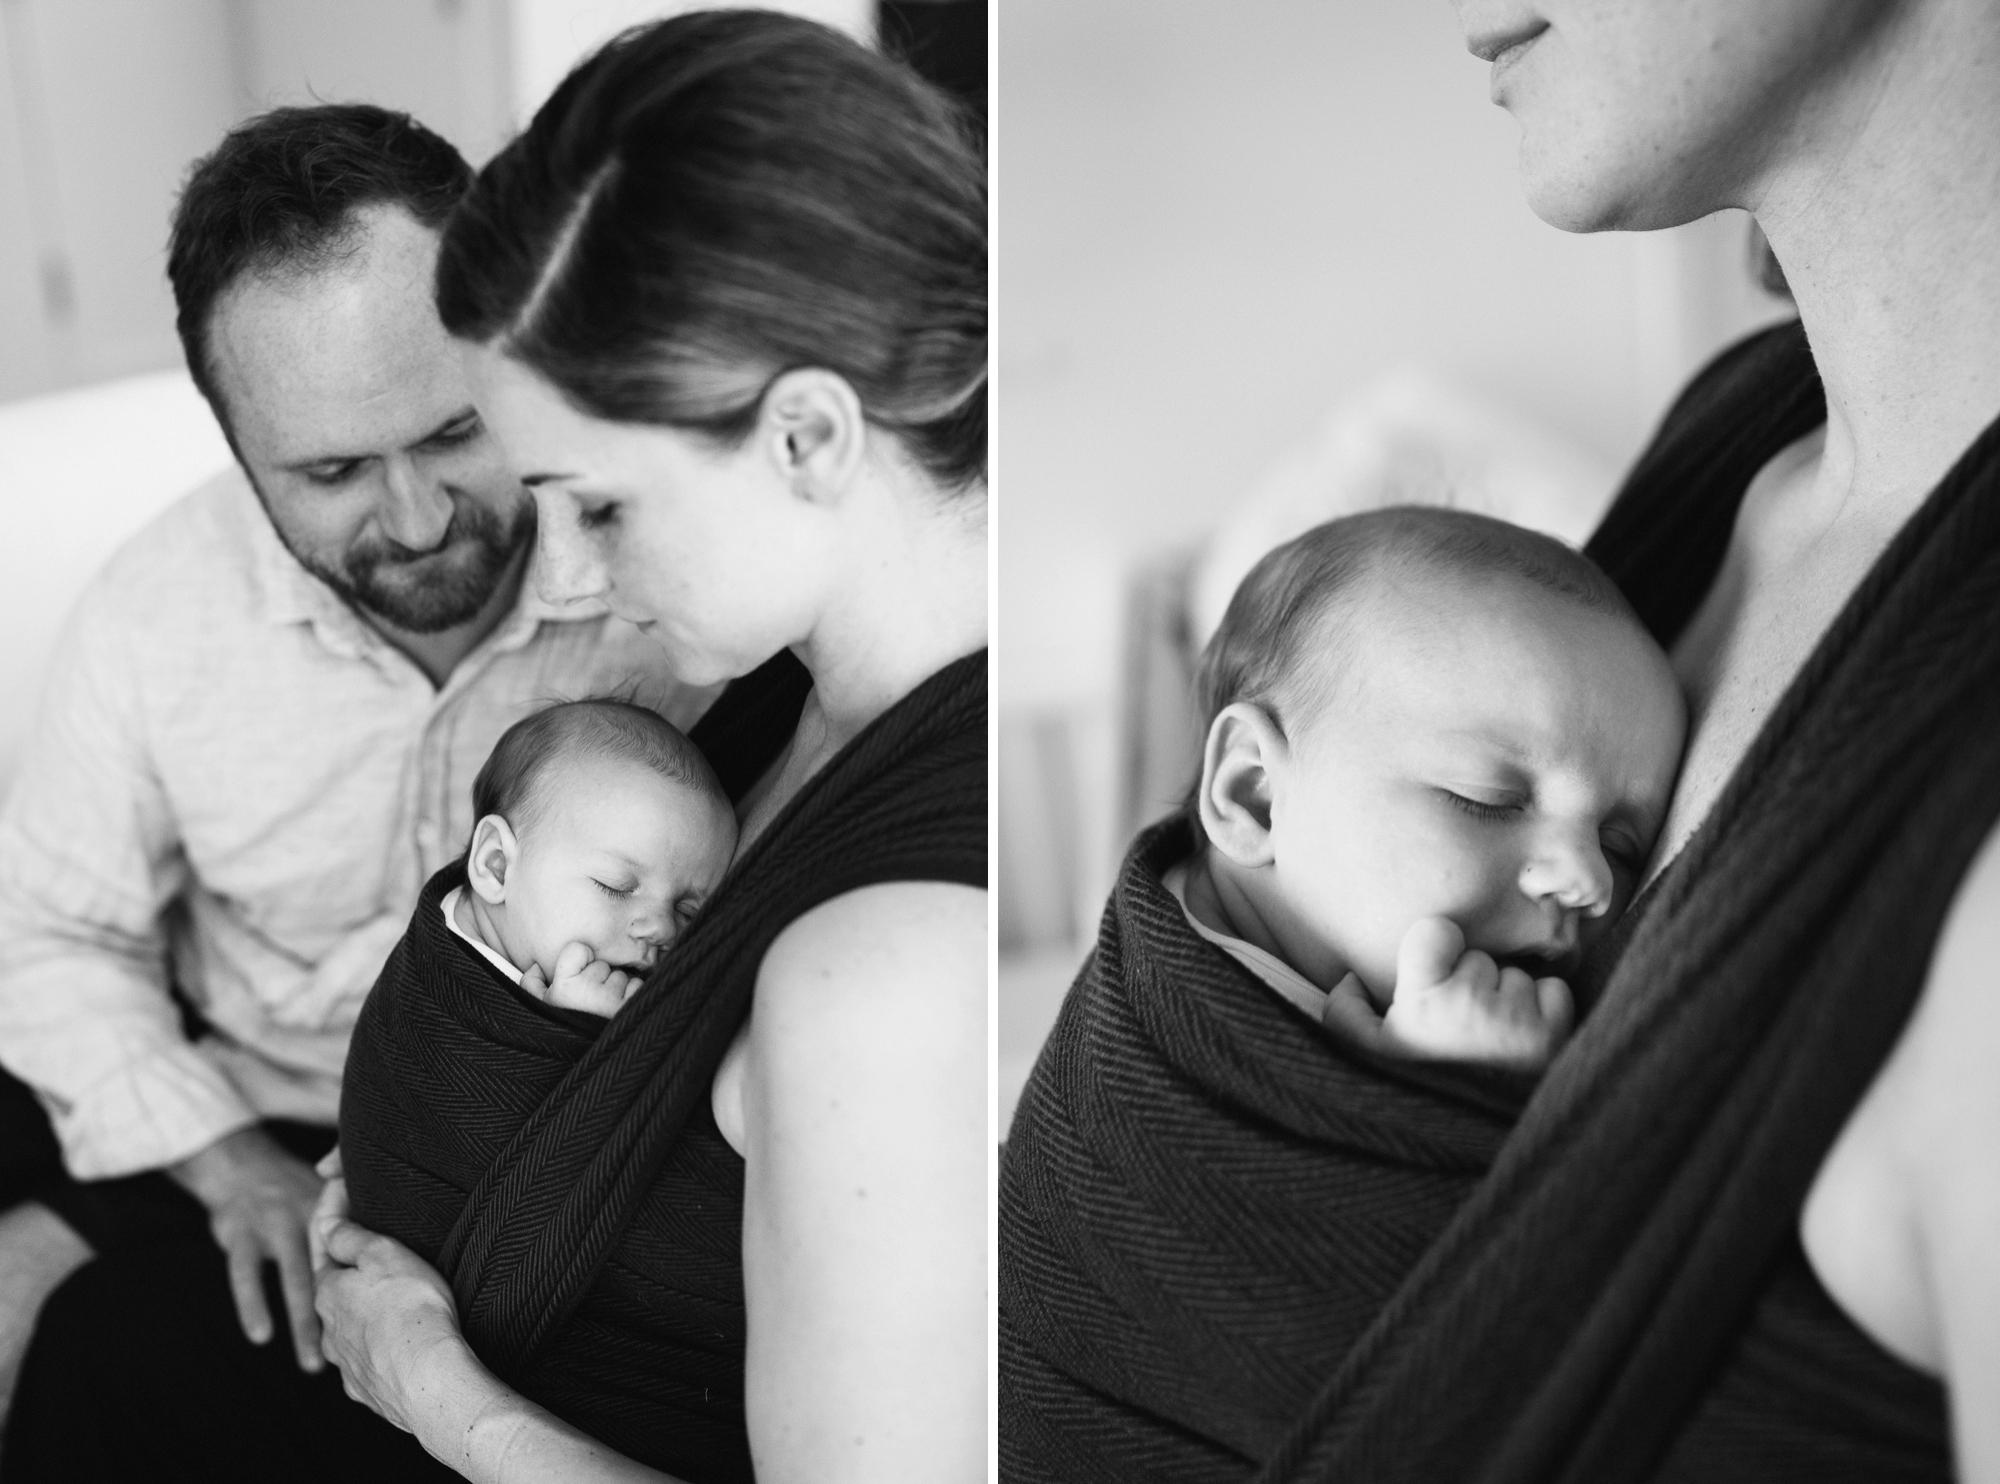 Brooklyn Mom holding newborn